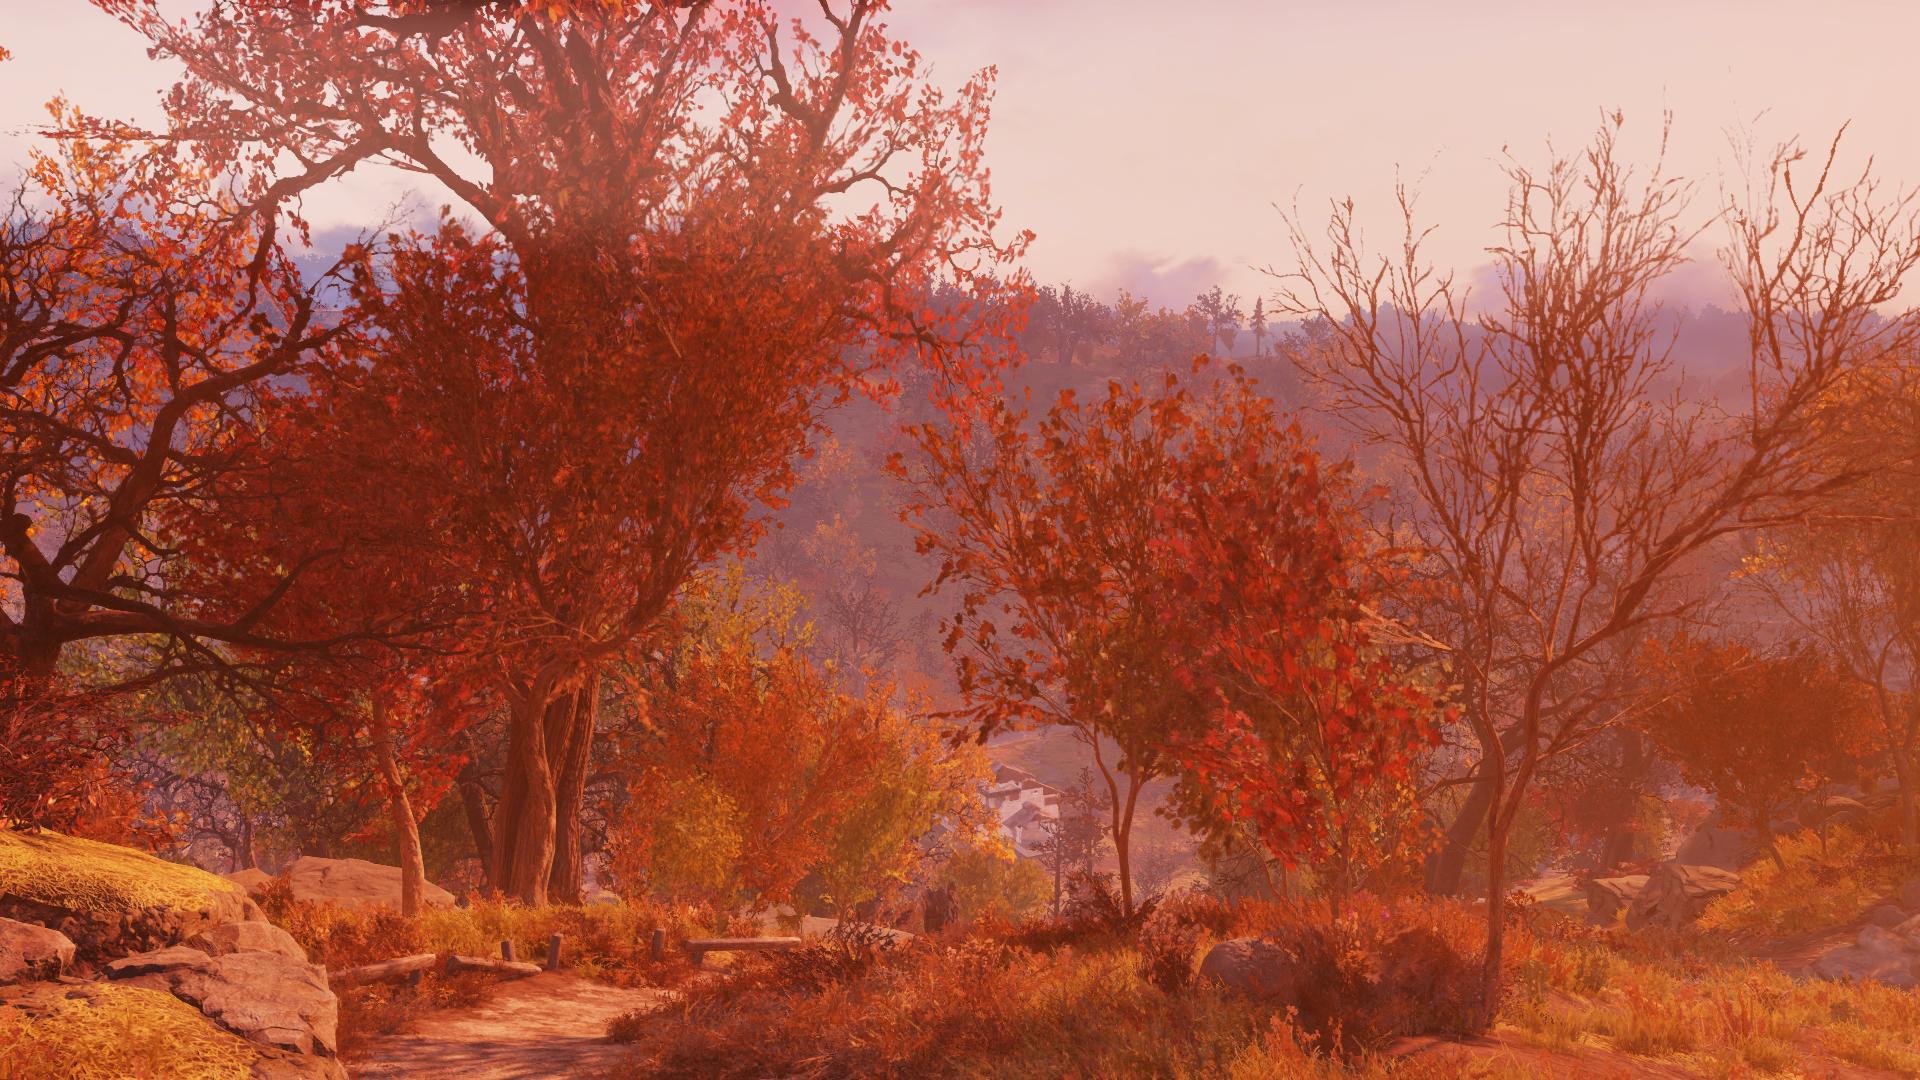 Осенний лес - Fallout 76